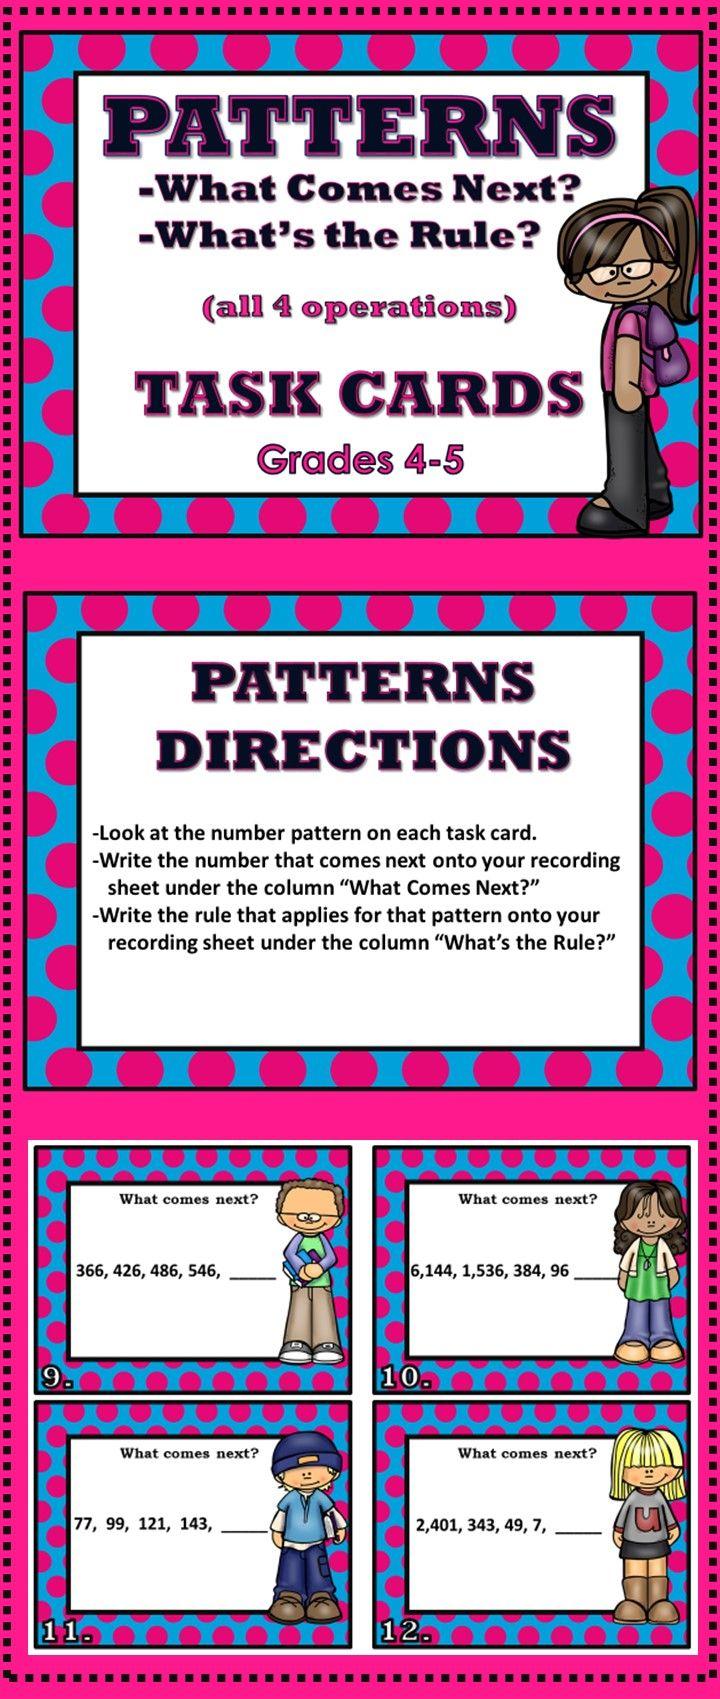 Patterns Task Cards - Grades 4-5 | Math patterns, 4th grade